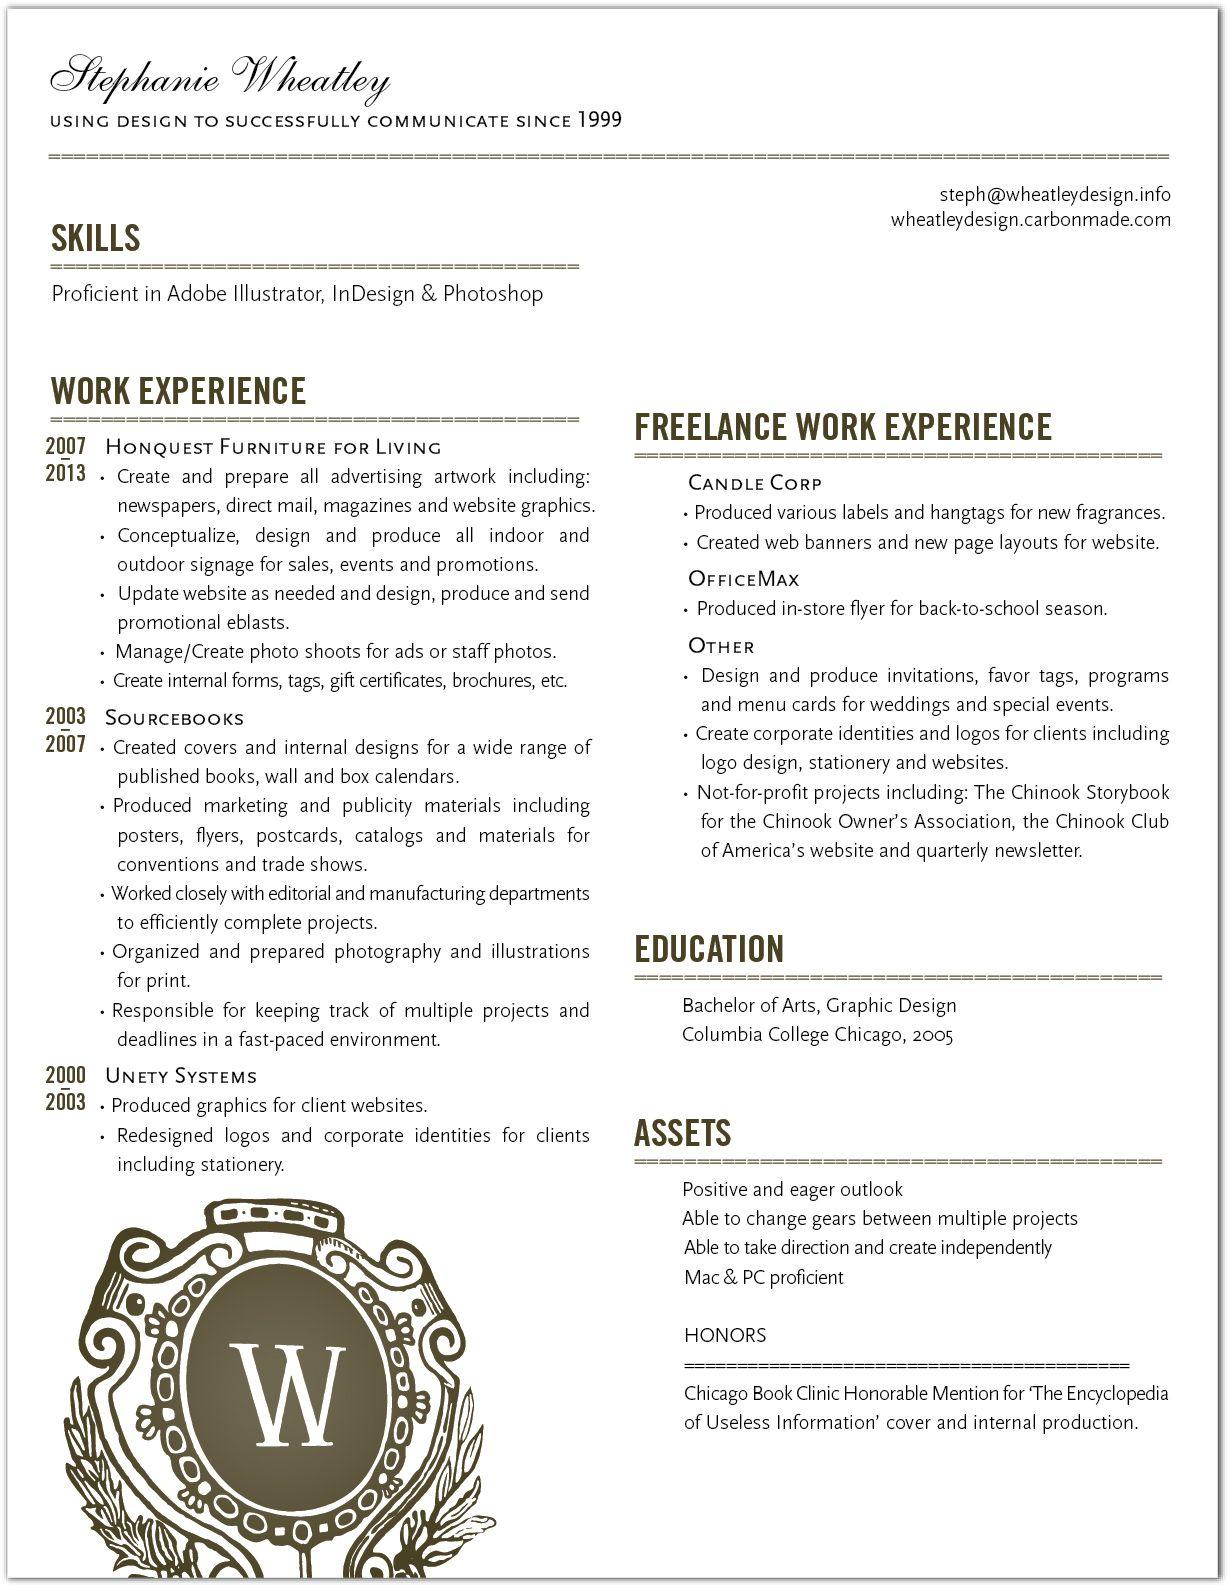 Stephanie Wheatley Graphic Designer Resume Employment